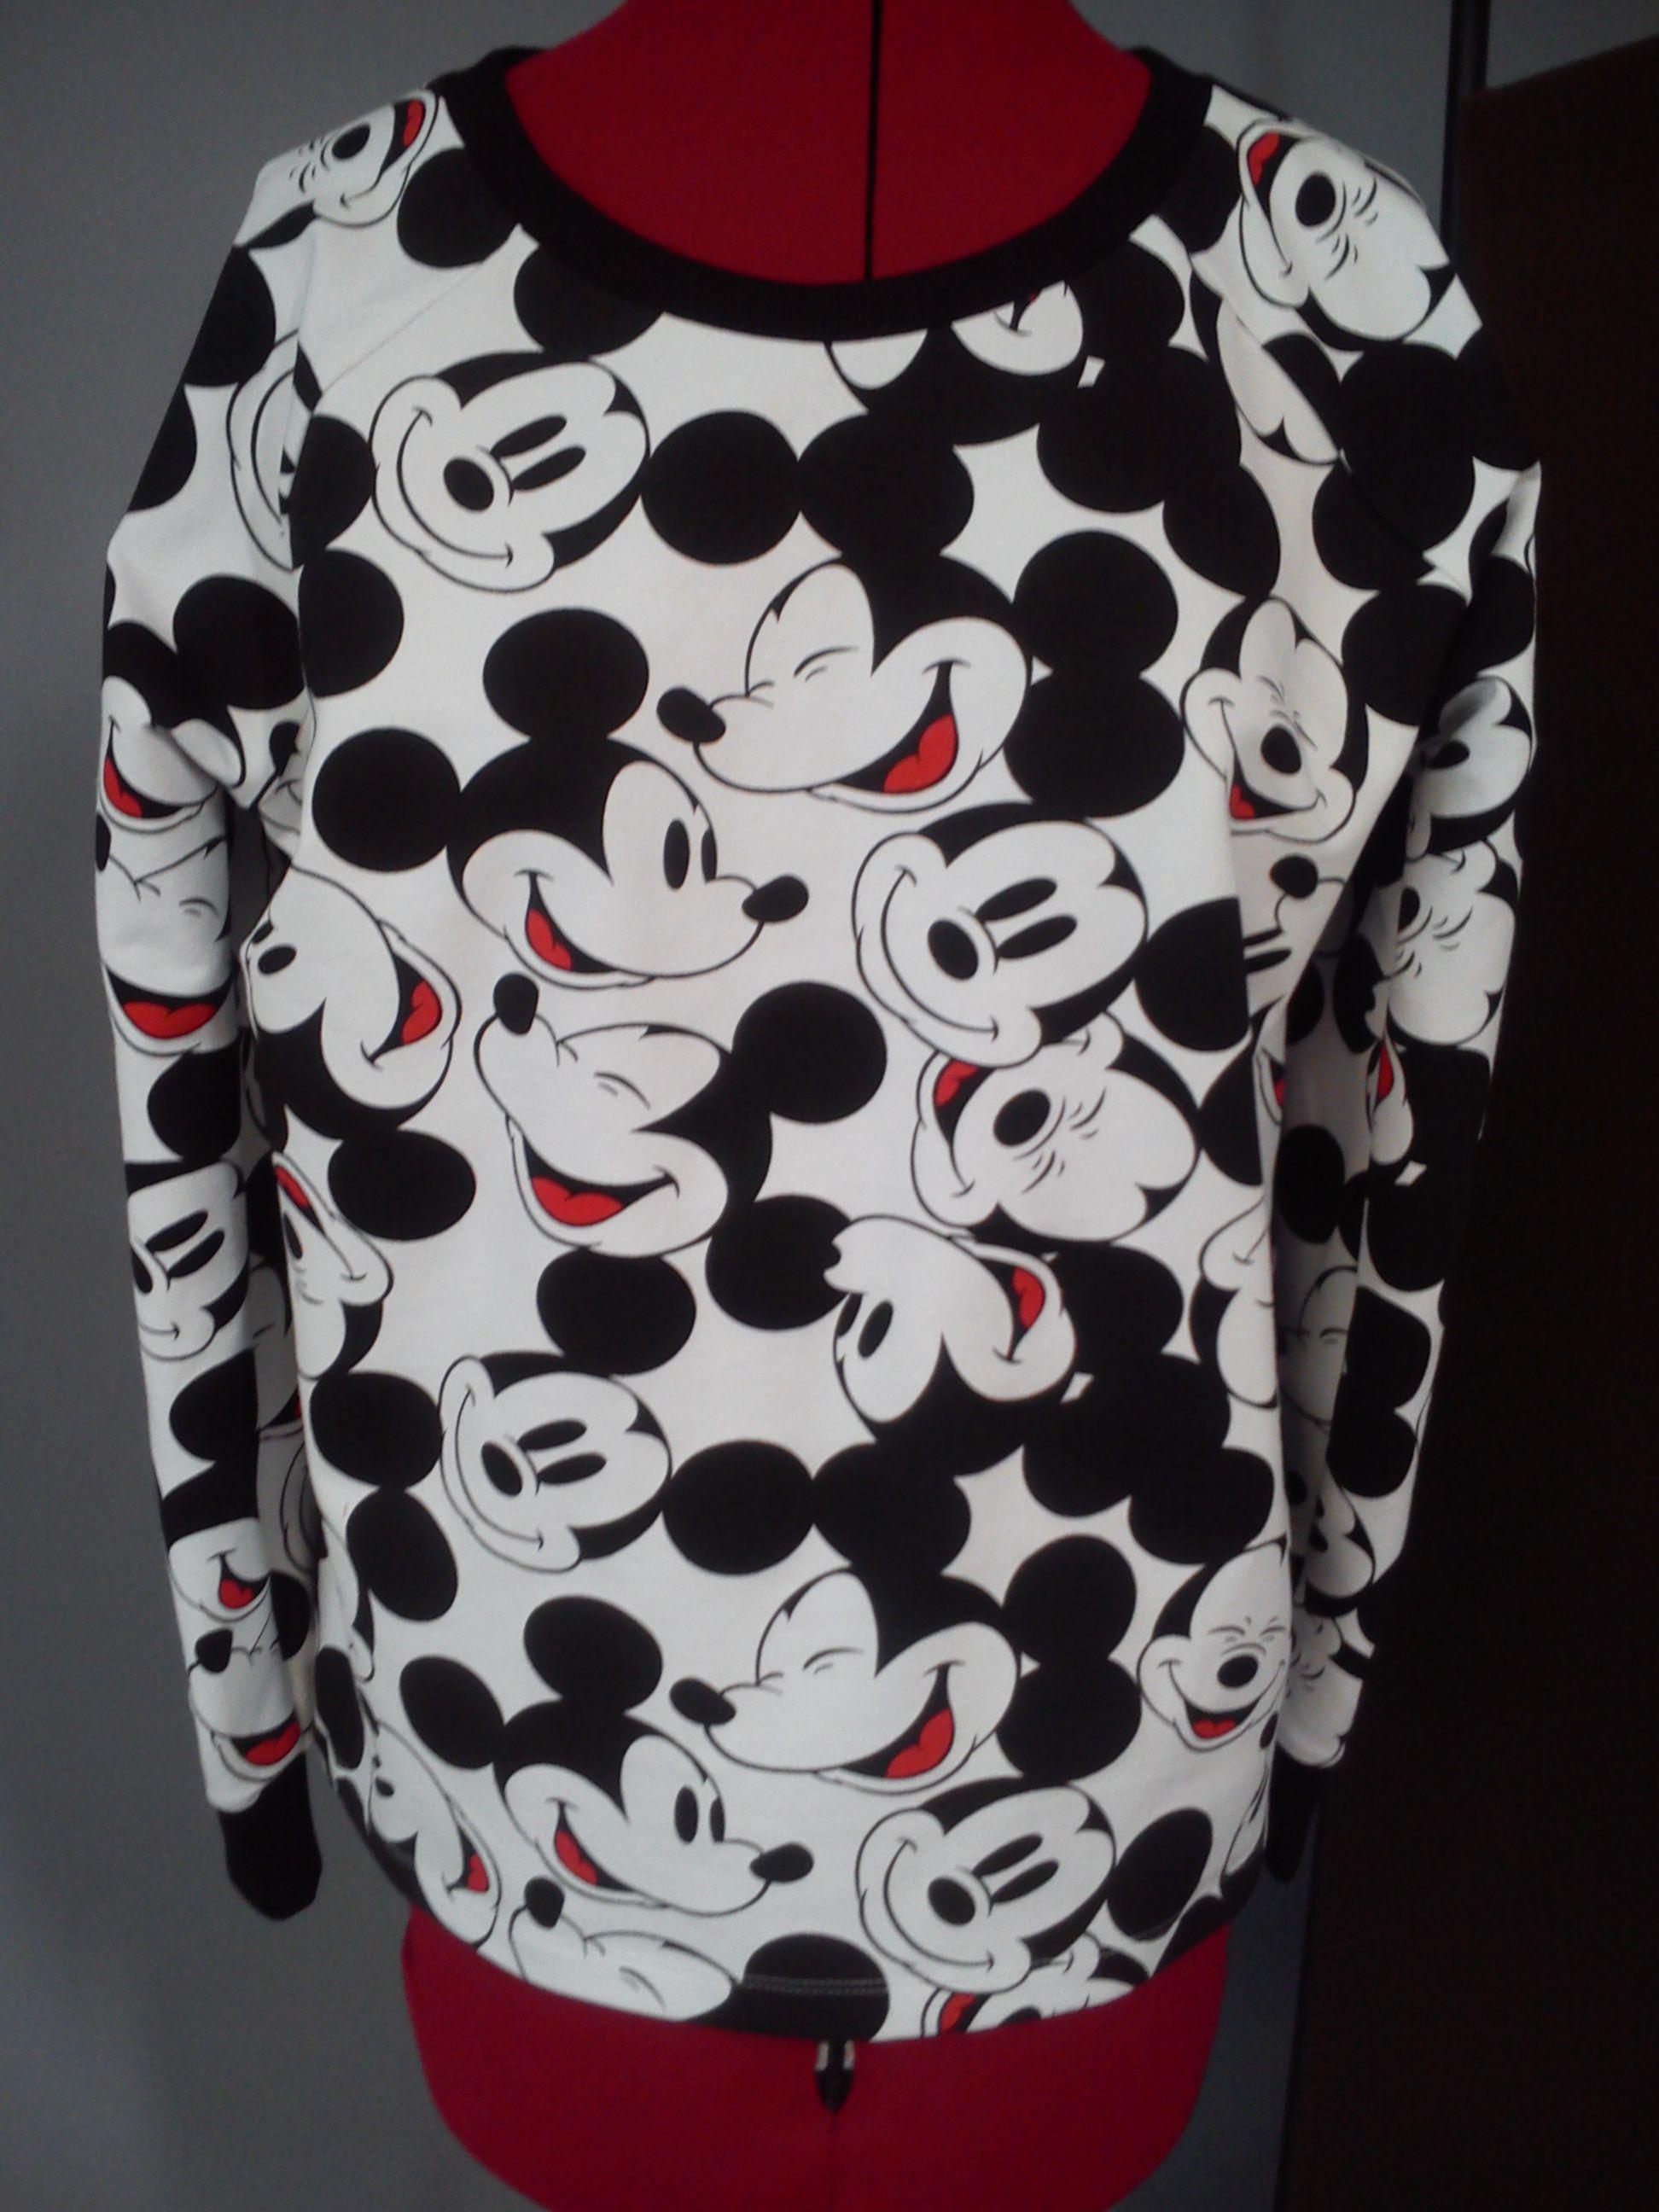 Pin By Aga Sac On Wlasne Projekty Bluzy